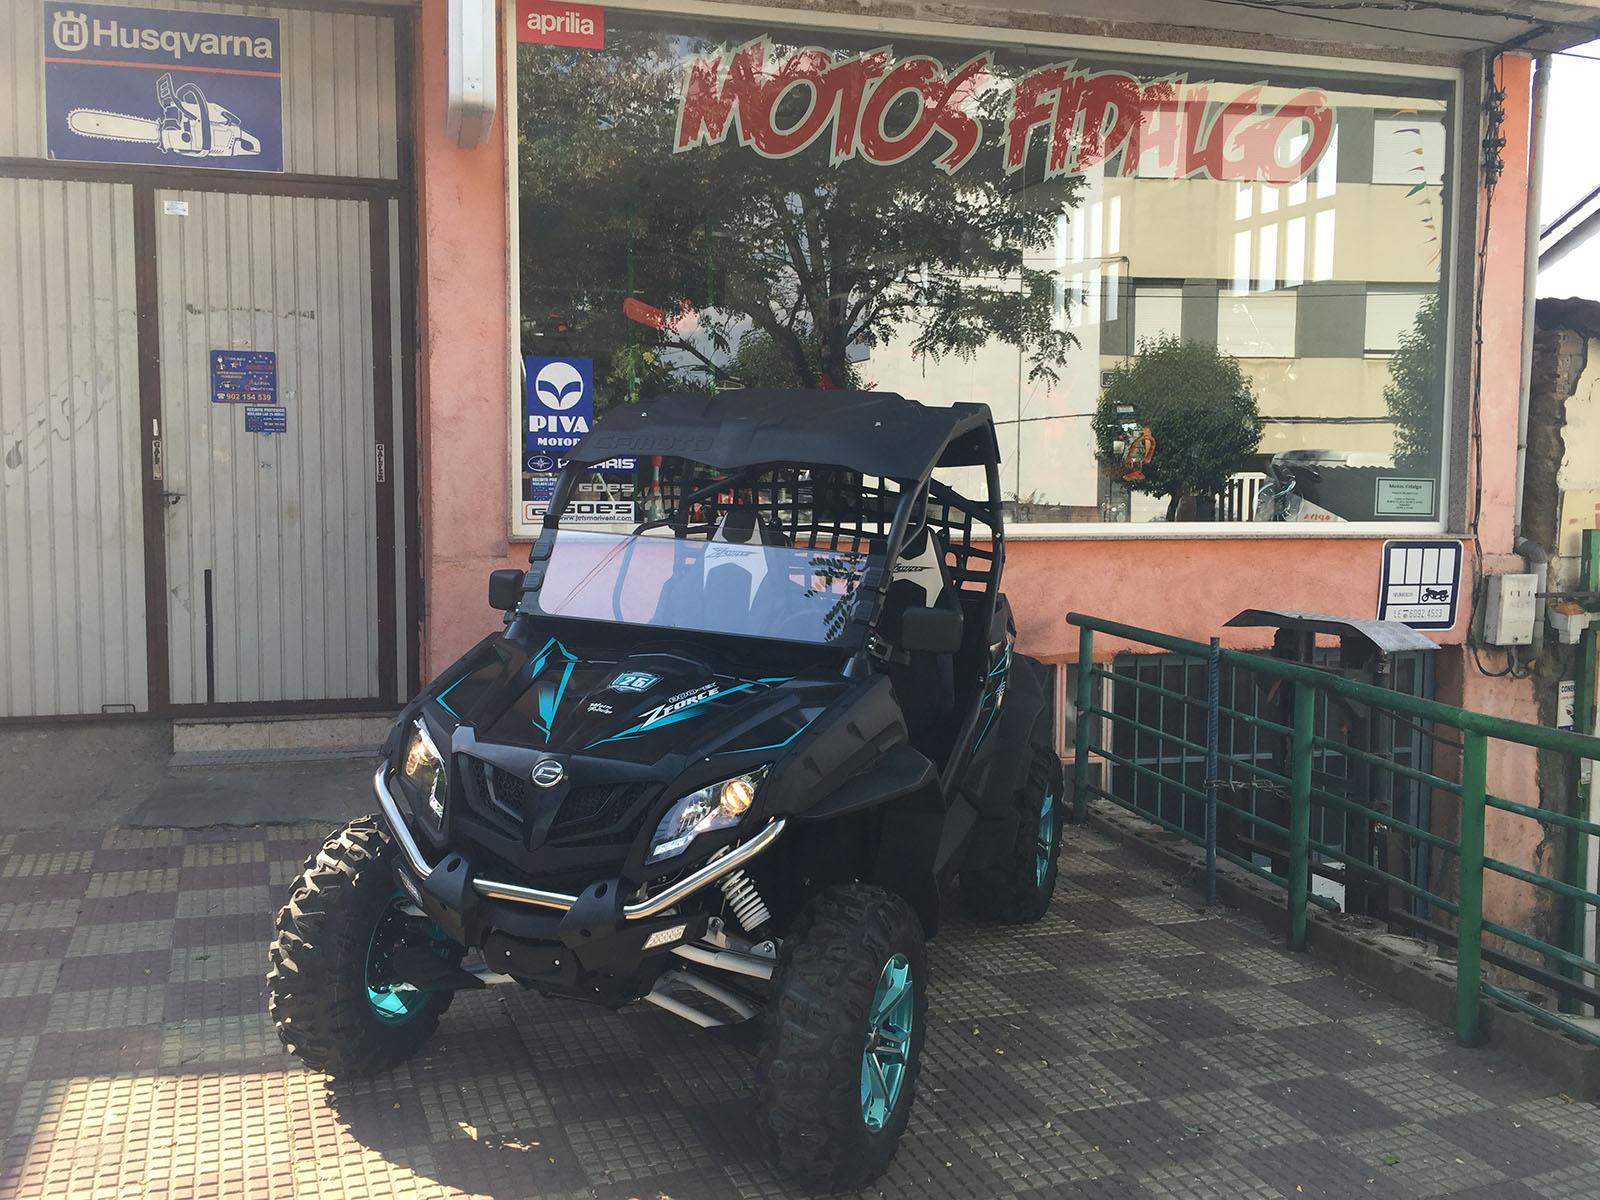 Tienda Motos - bembibre